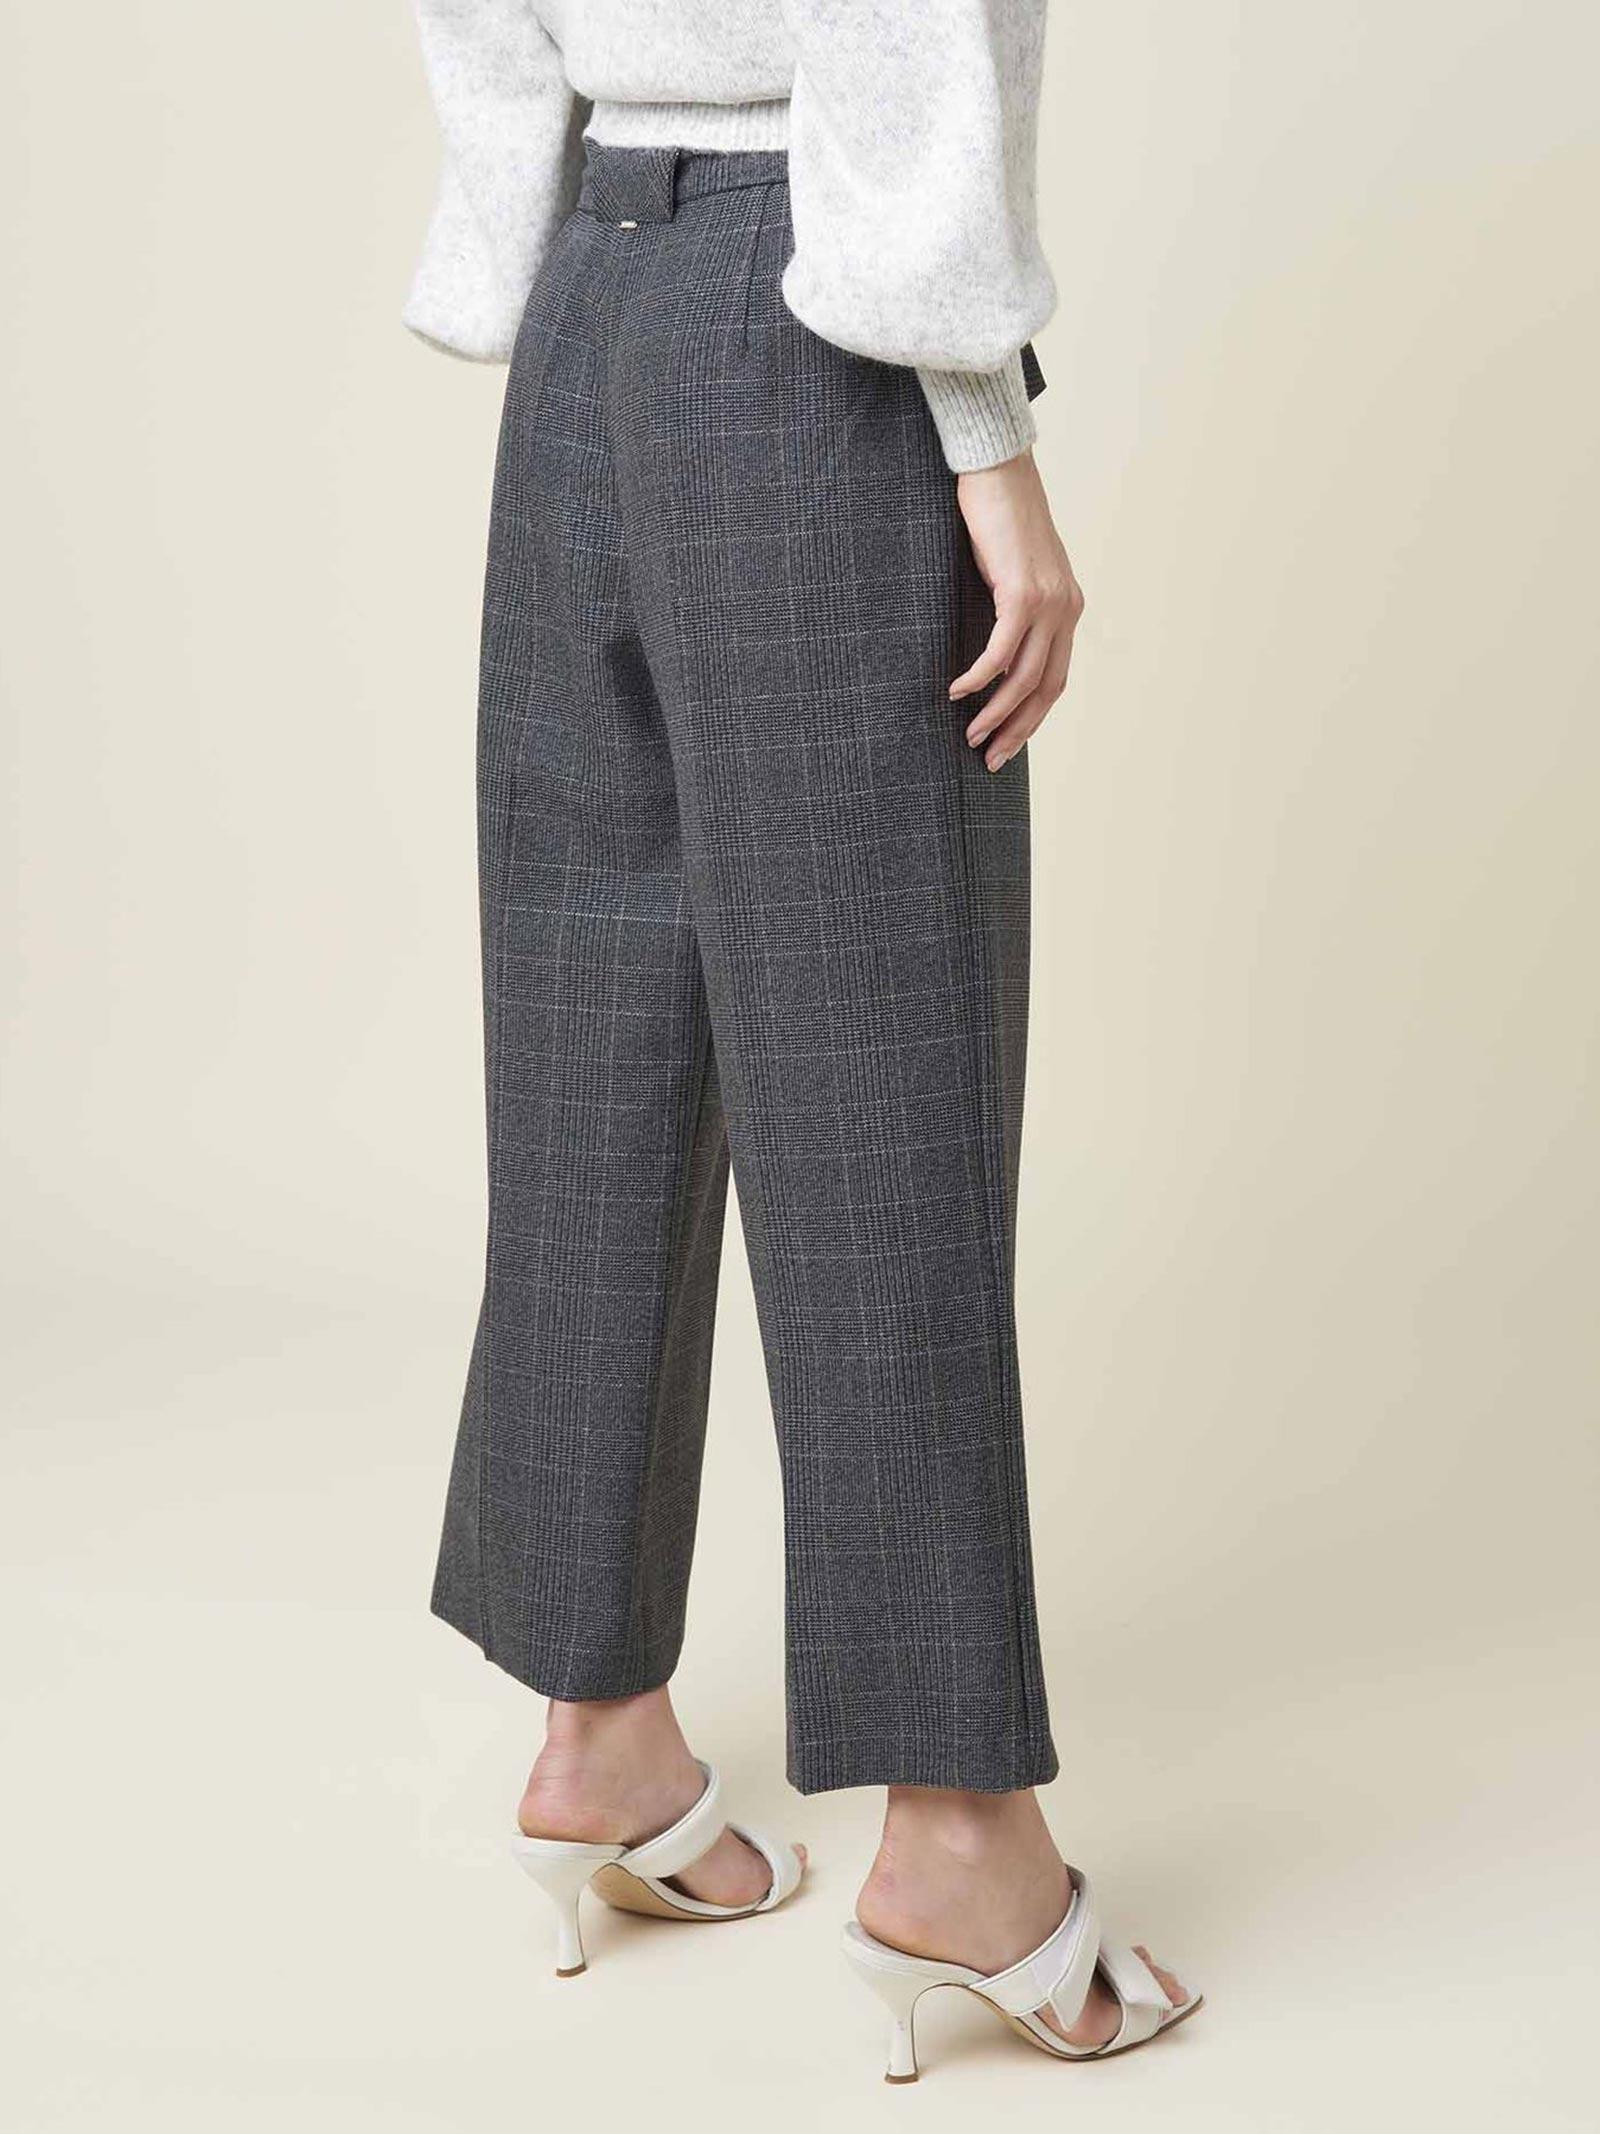 pantalone a vita alta trama check SILVIAN HEACH | Pantalone | PGA20639PARPW